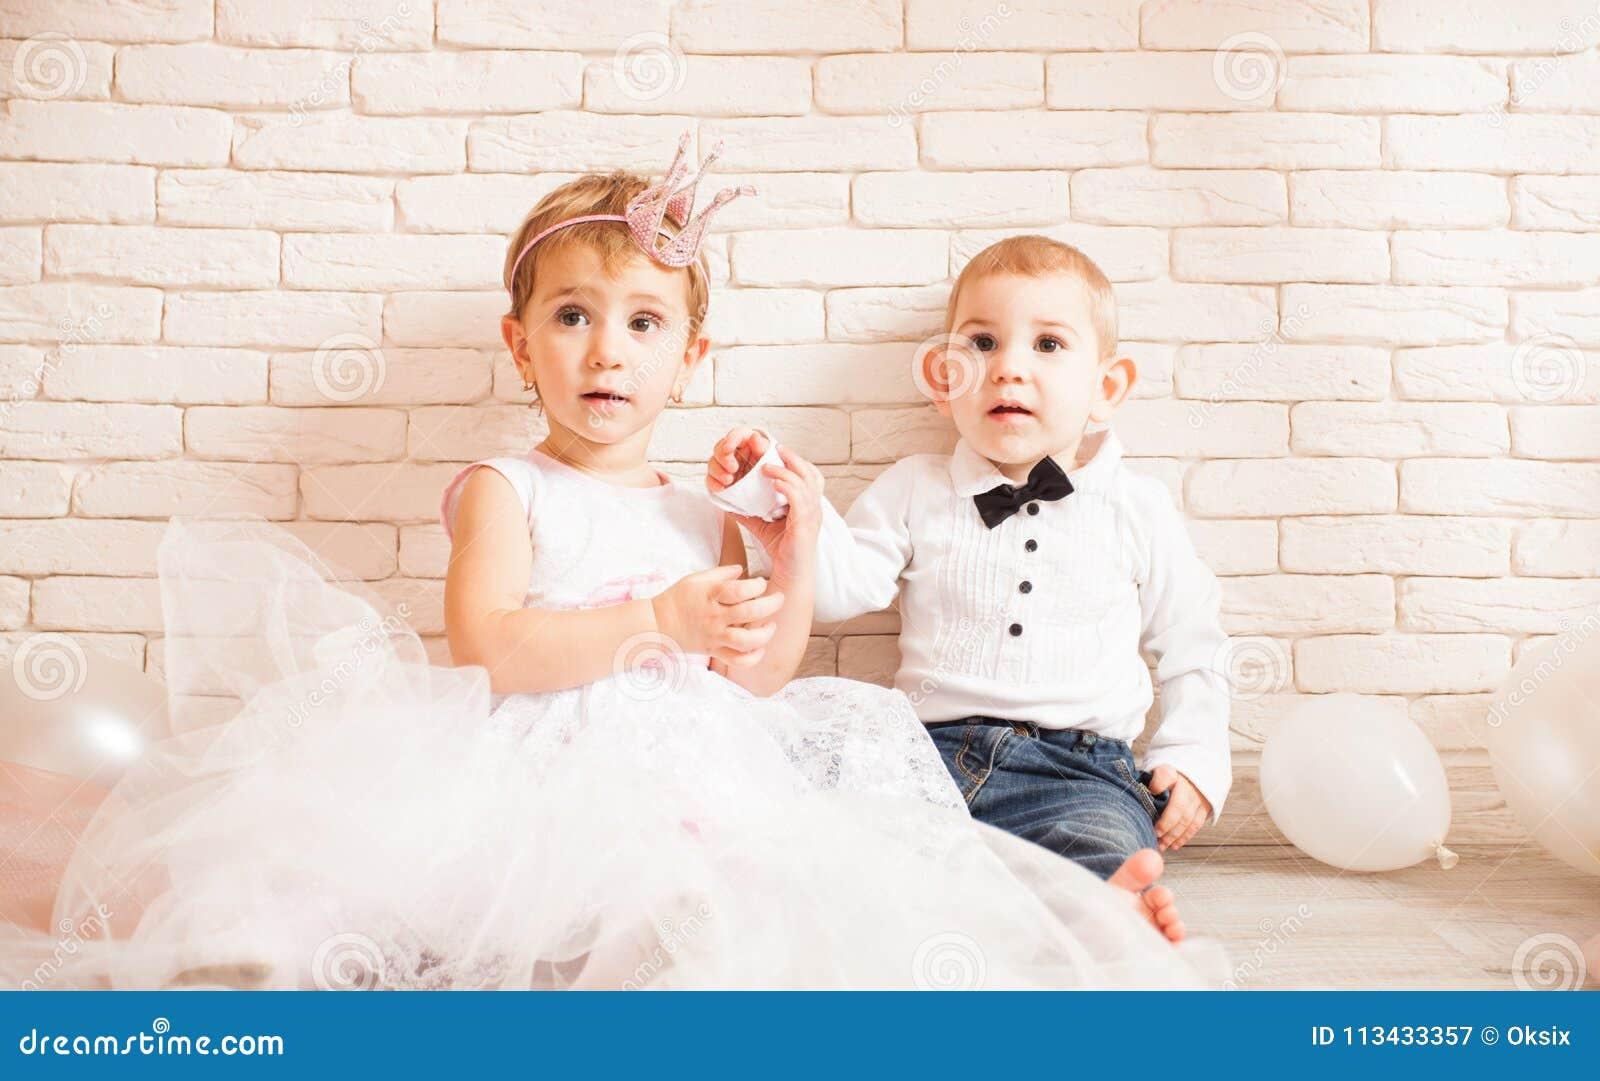 Love Relationship Metaphor Stock Image Image Of People 113433357